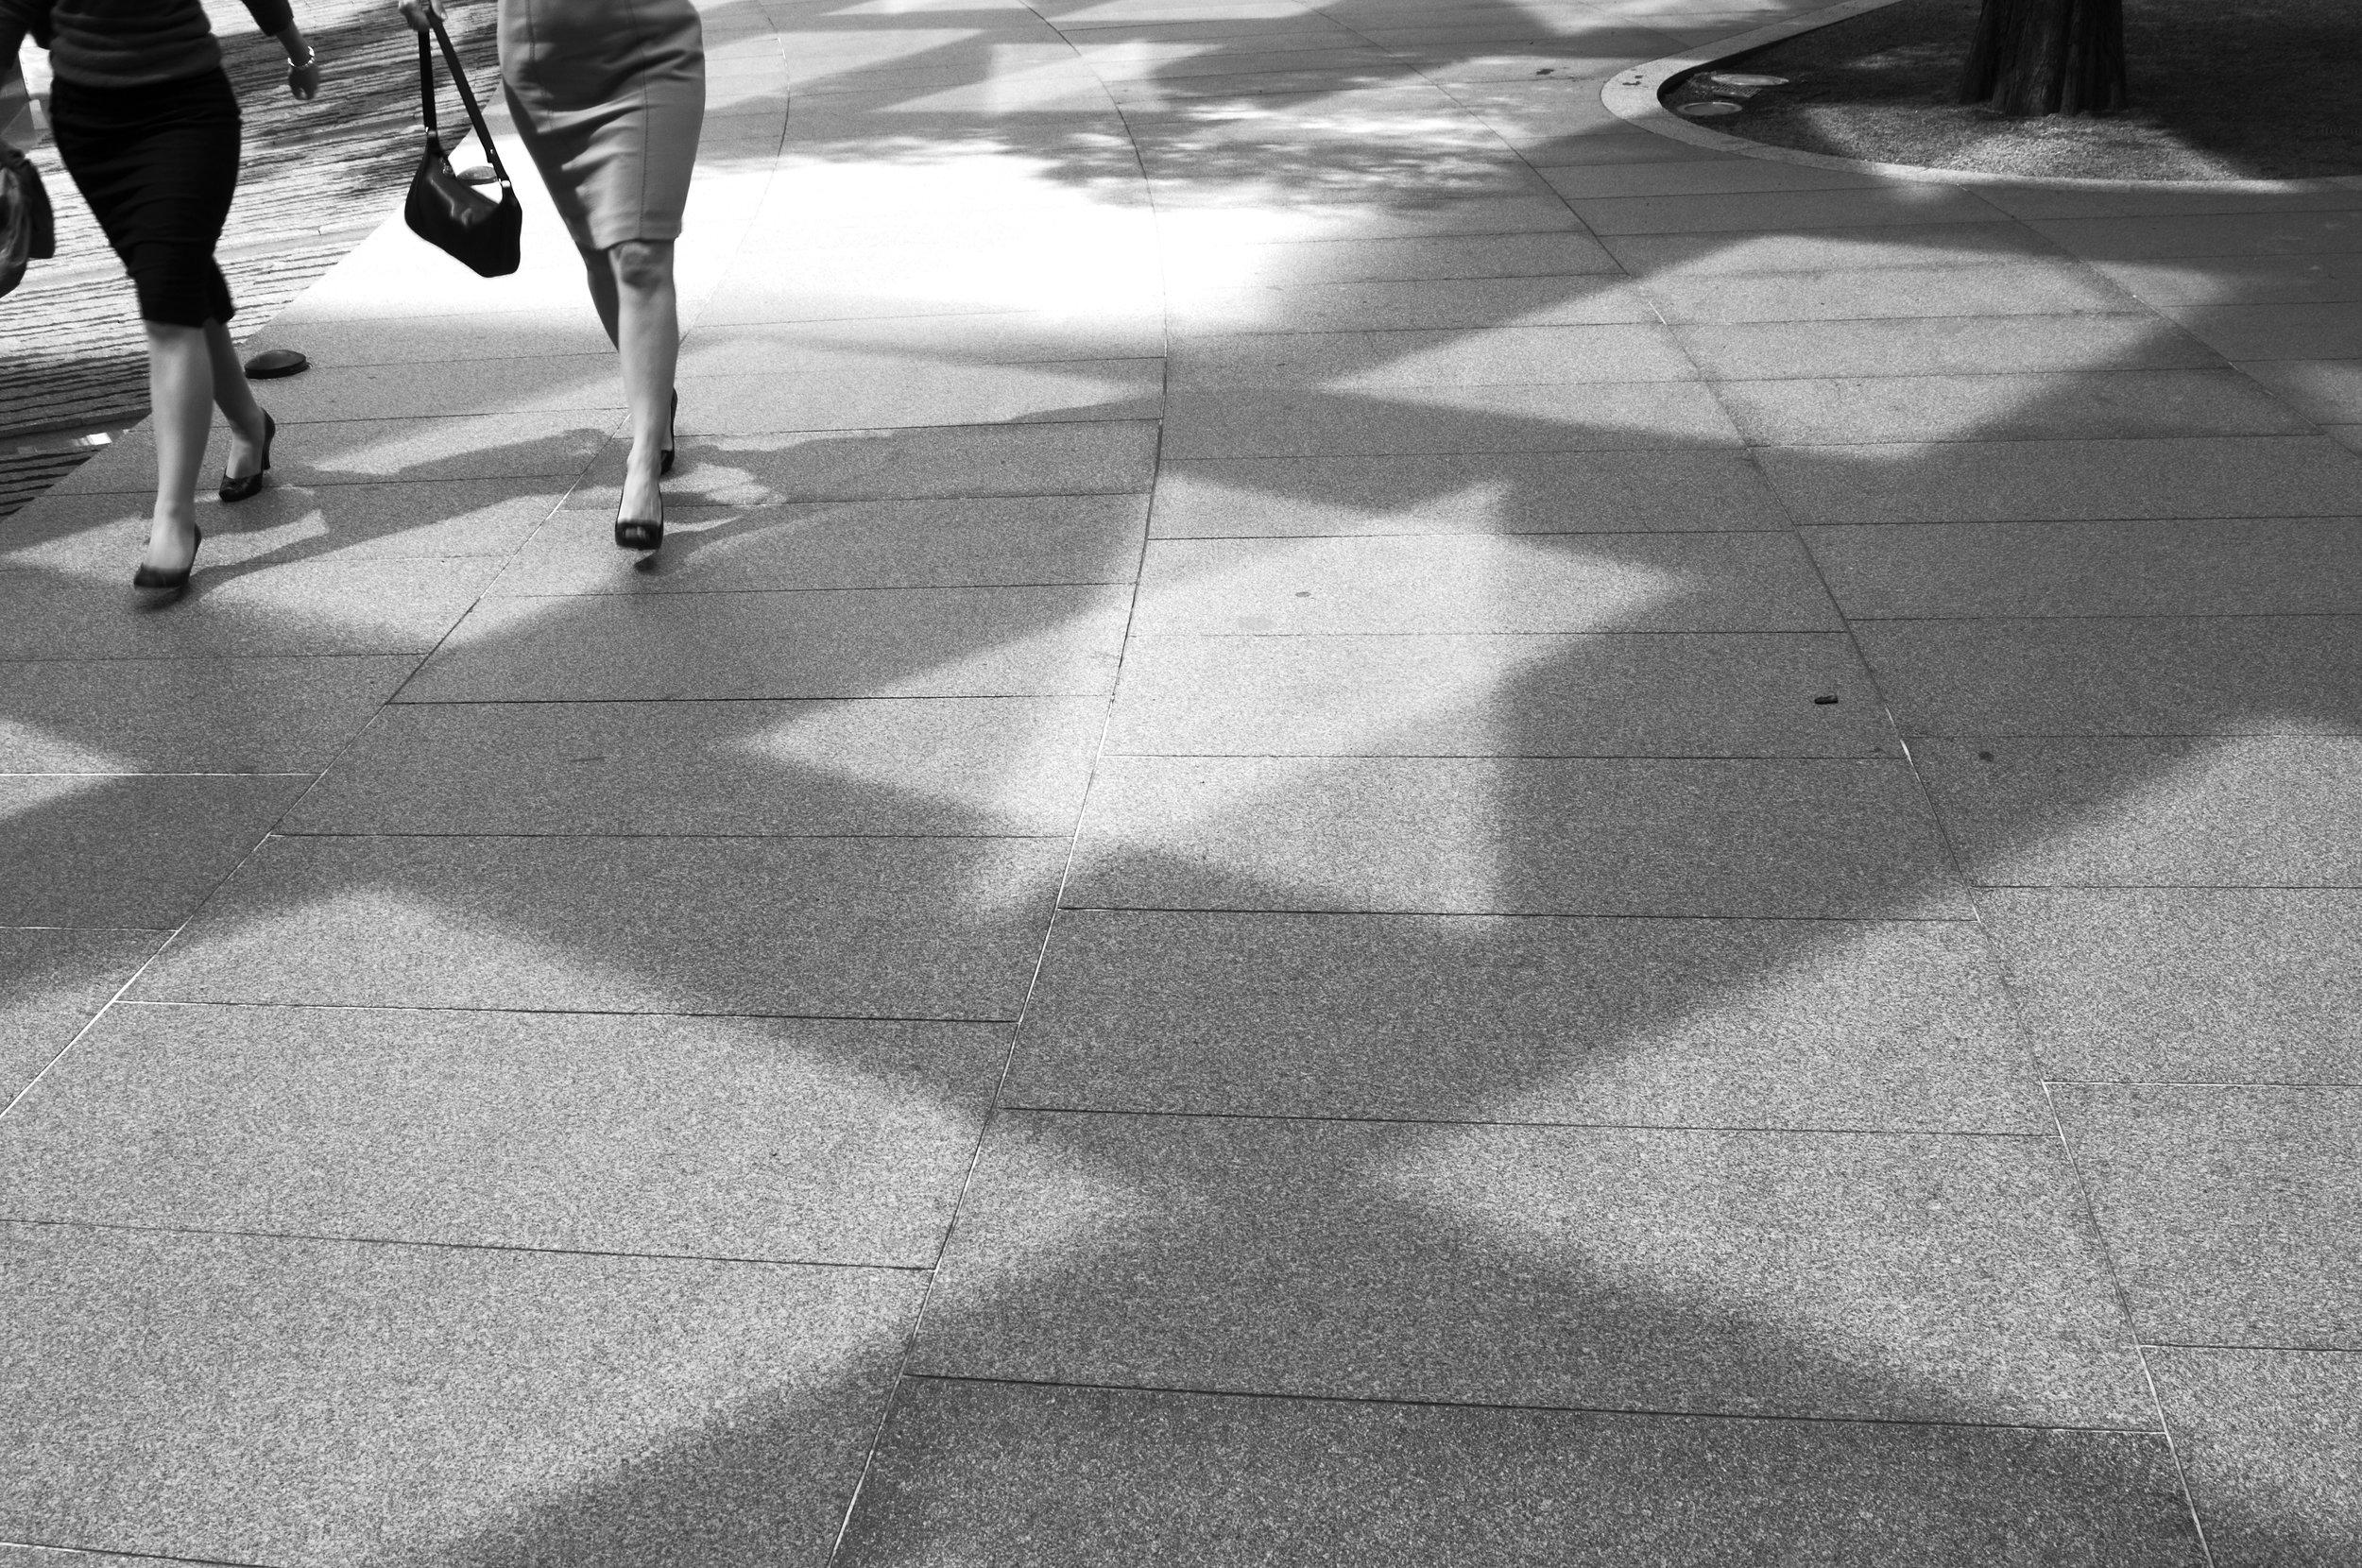 Street_Photography_001